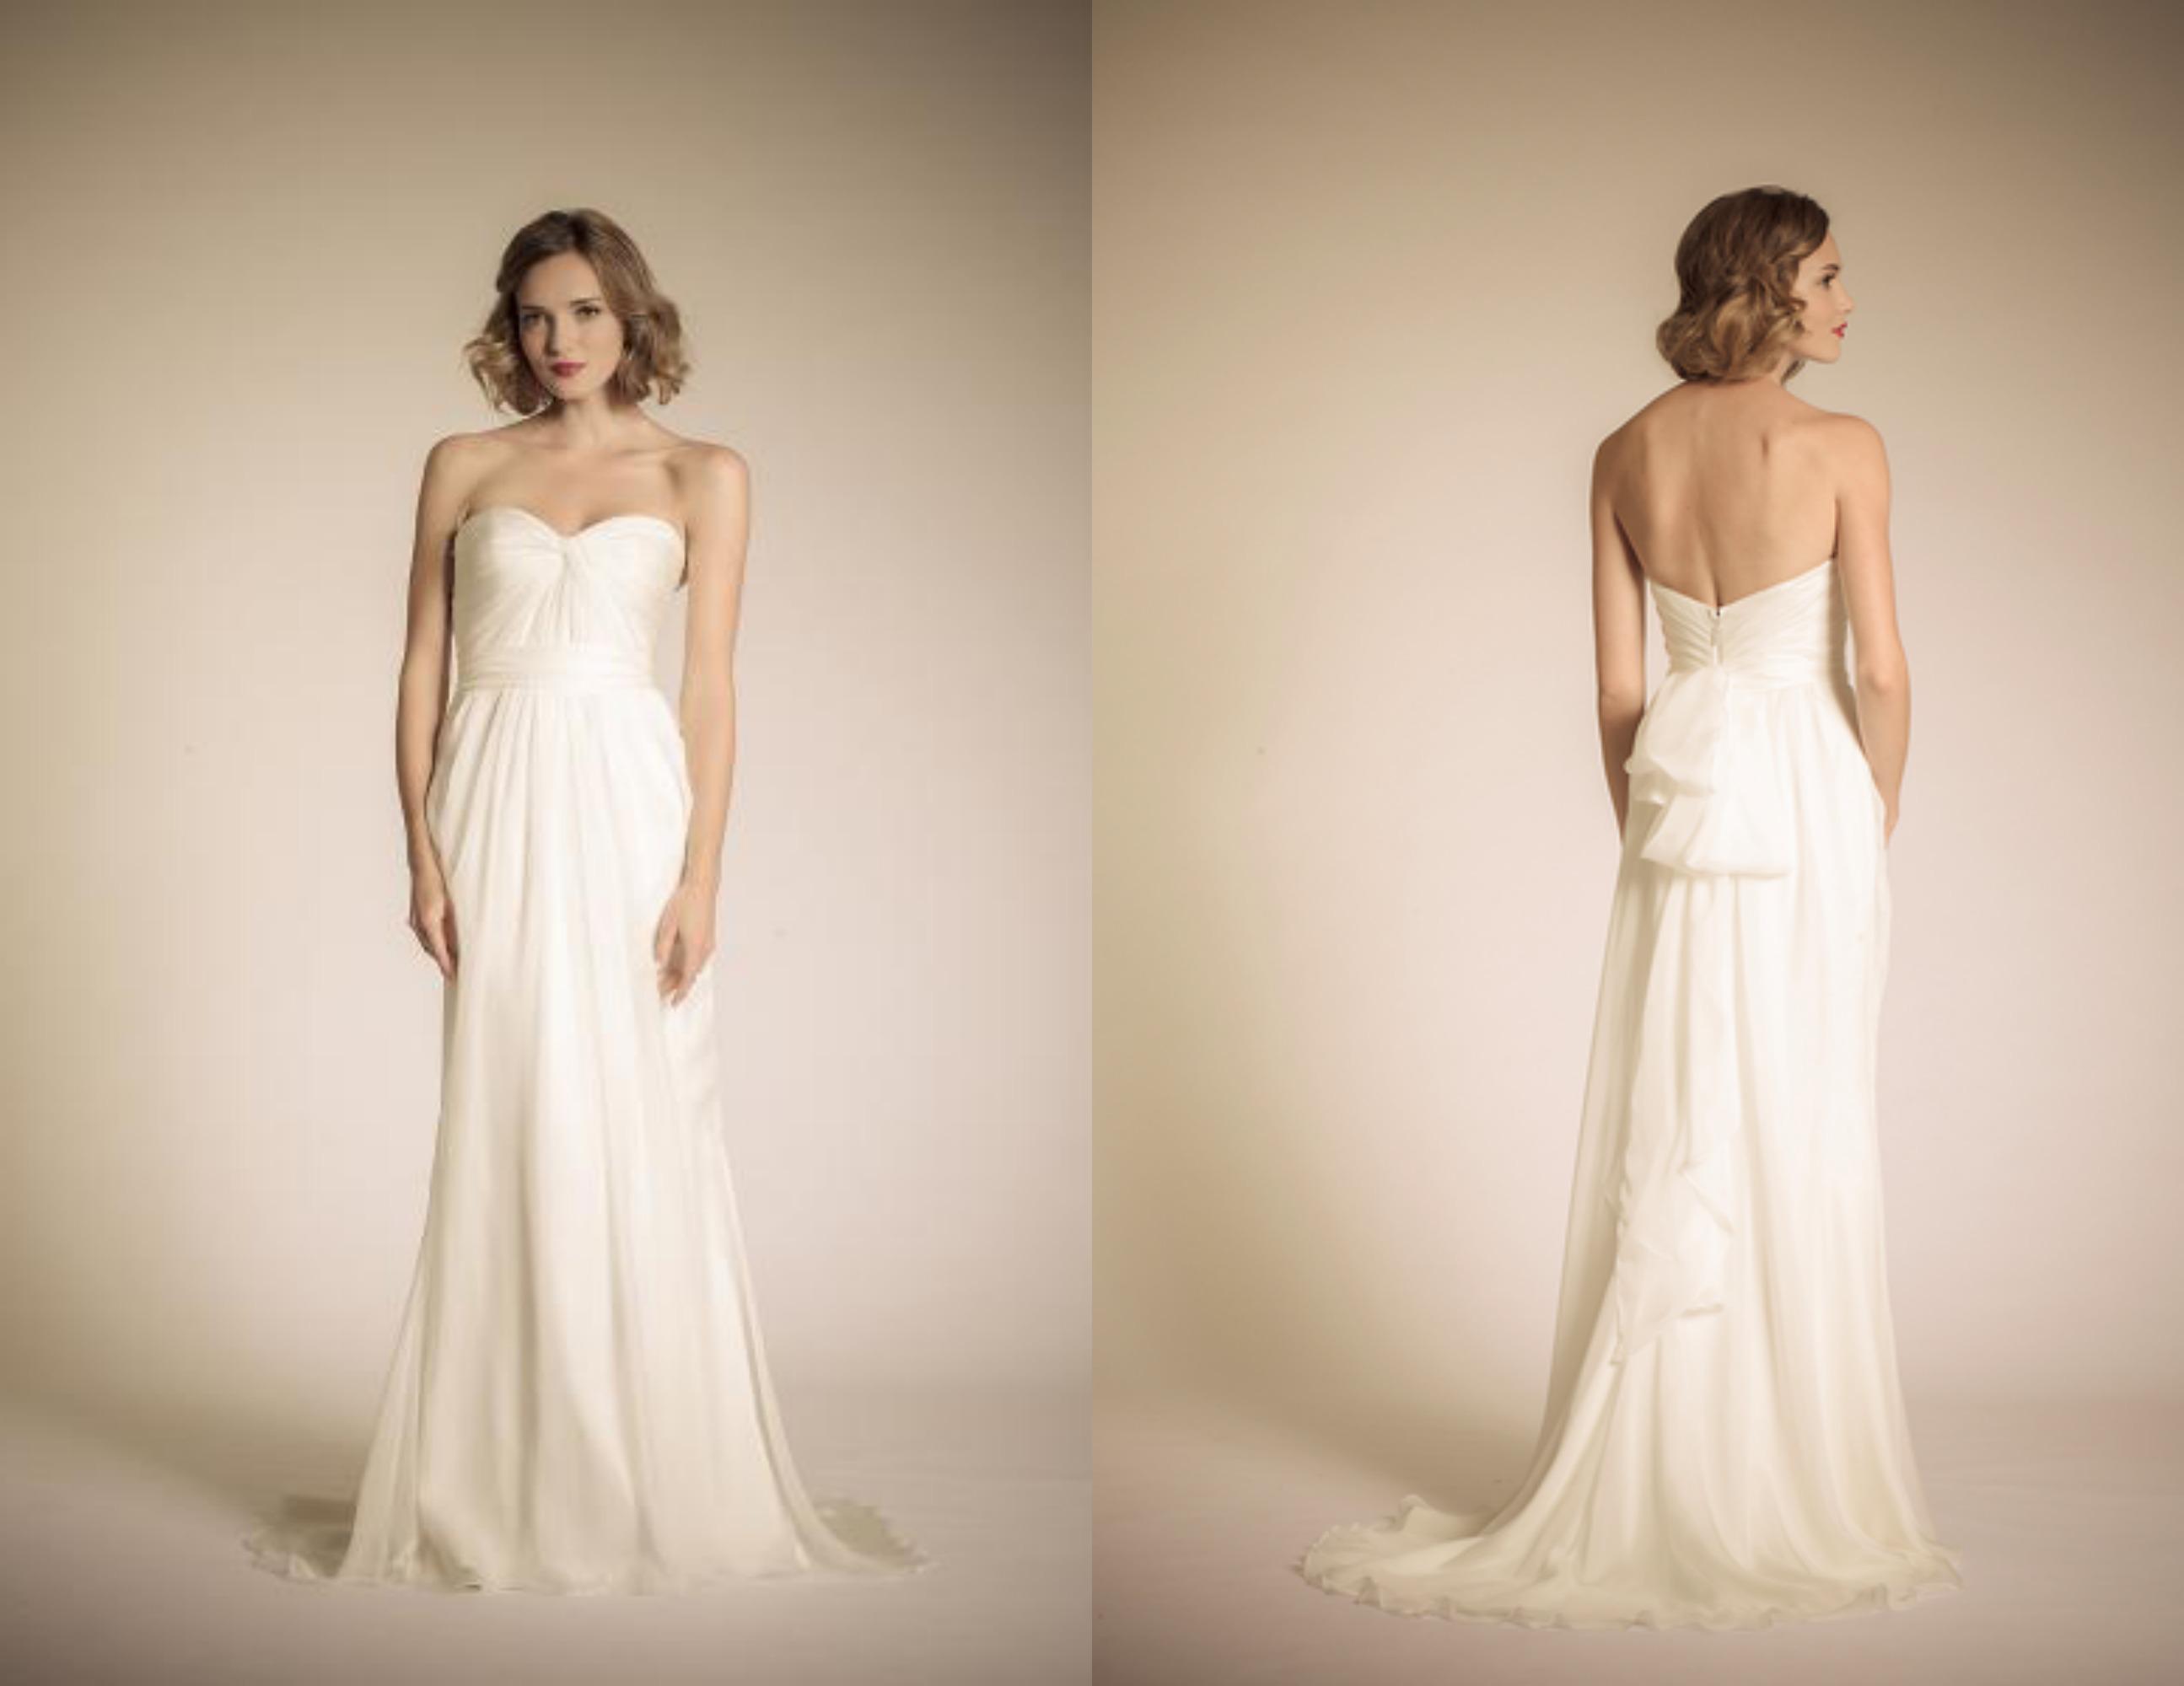 preppy wedding dresses photo - 1